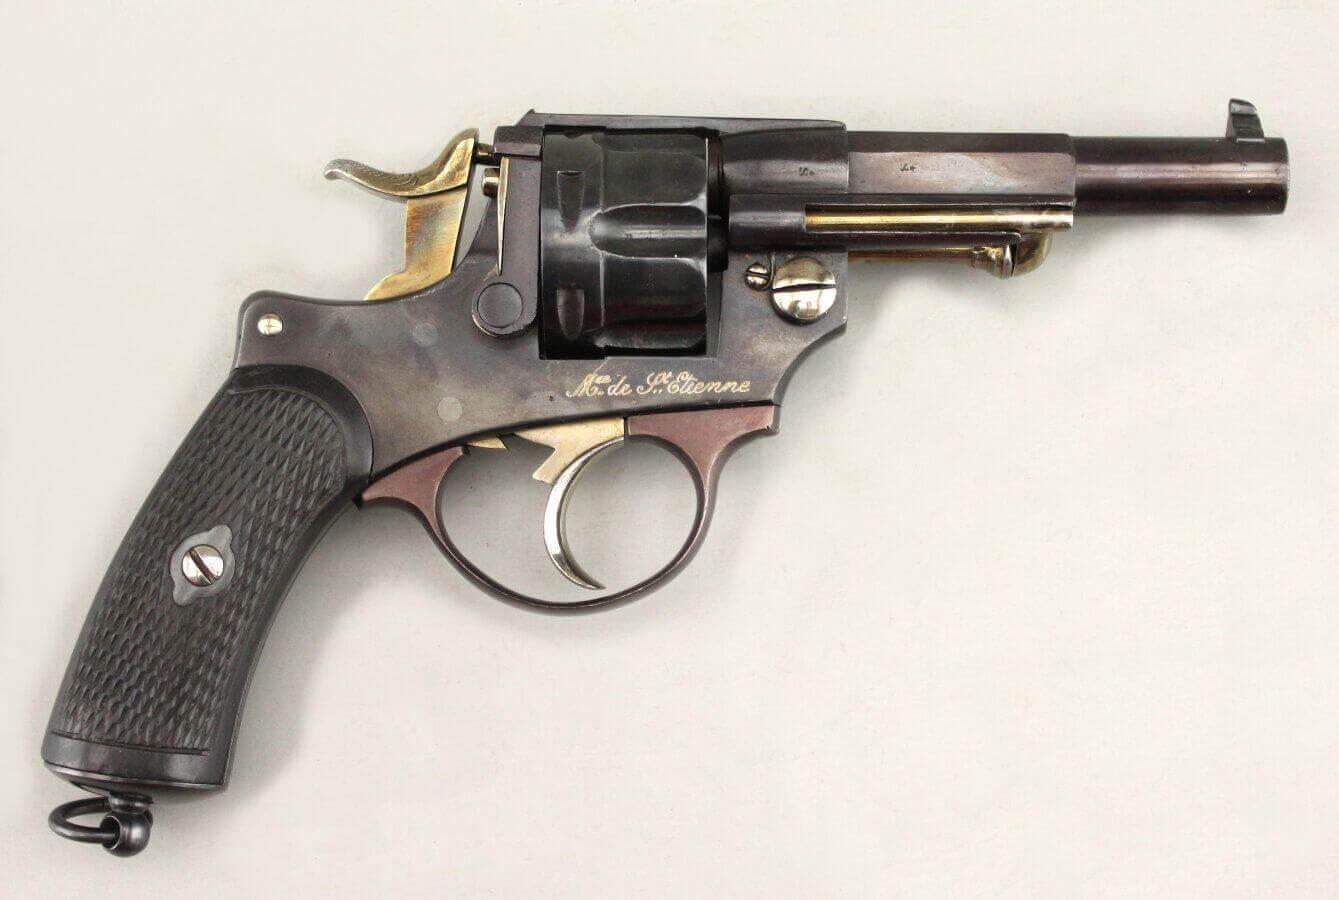 Revolver 1874 civil (St Etienne) marqué Protectorat du Tonkin